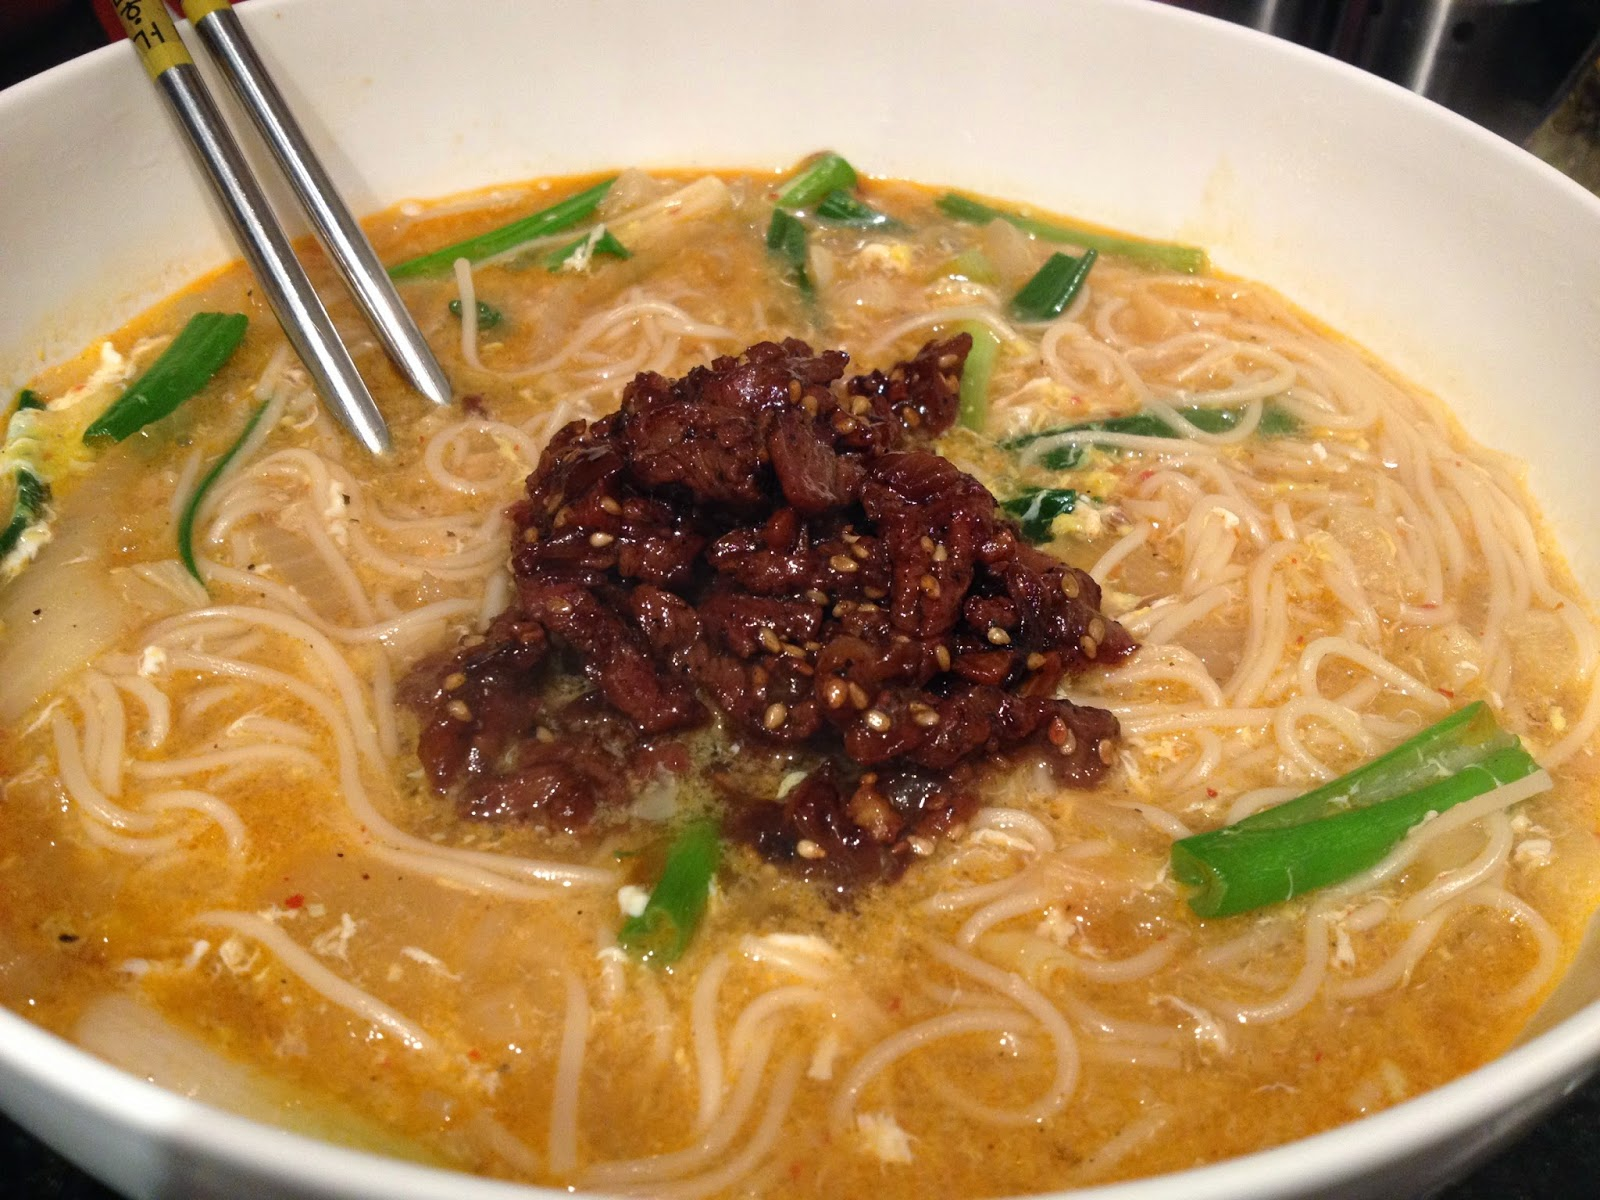 #Guk Su Korean Somen Noodles in Beef Broth